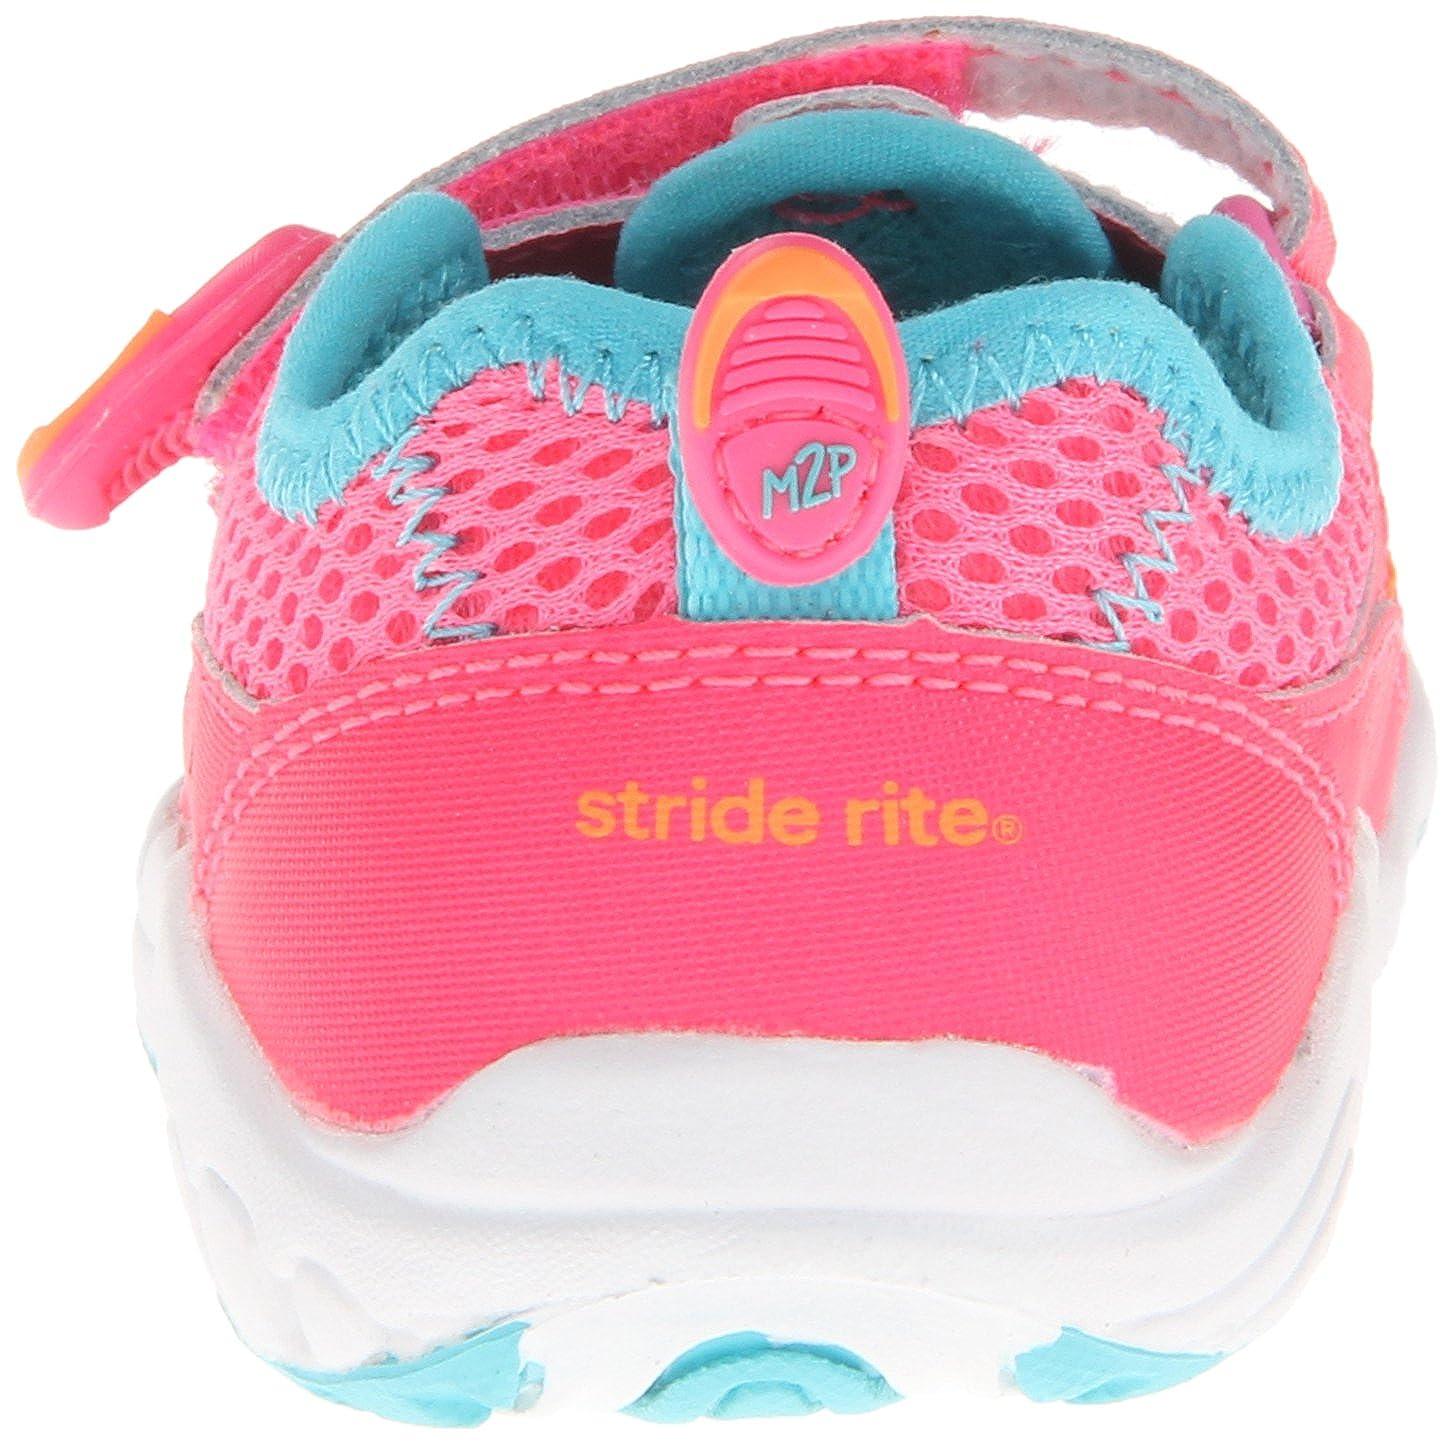 K Toddler M2P Baby Aqua Stride Rite Made 2 Play  Baby Aqua Flat